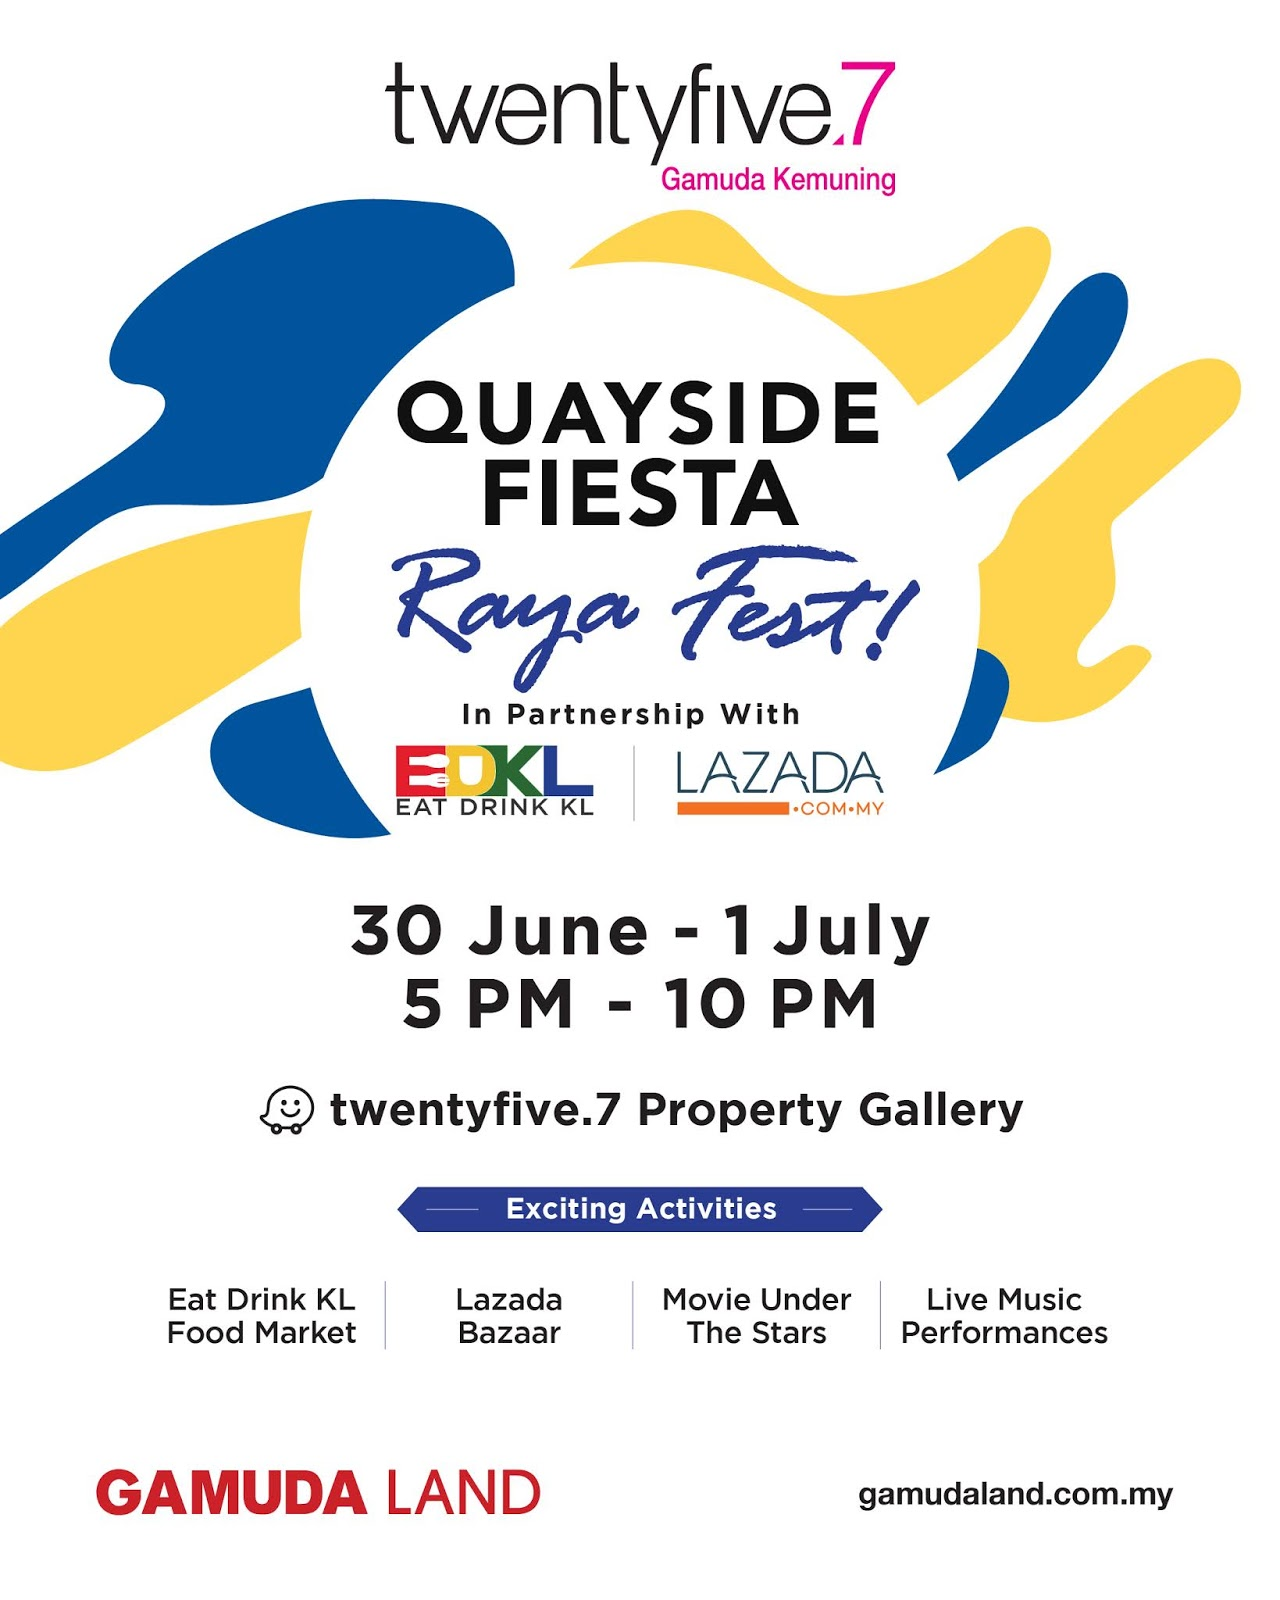 Quayside Fiesta, twentyfive.7 Kota Kemuning